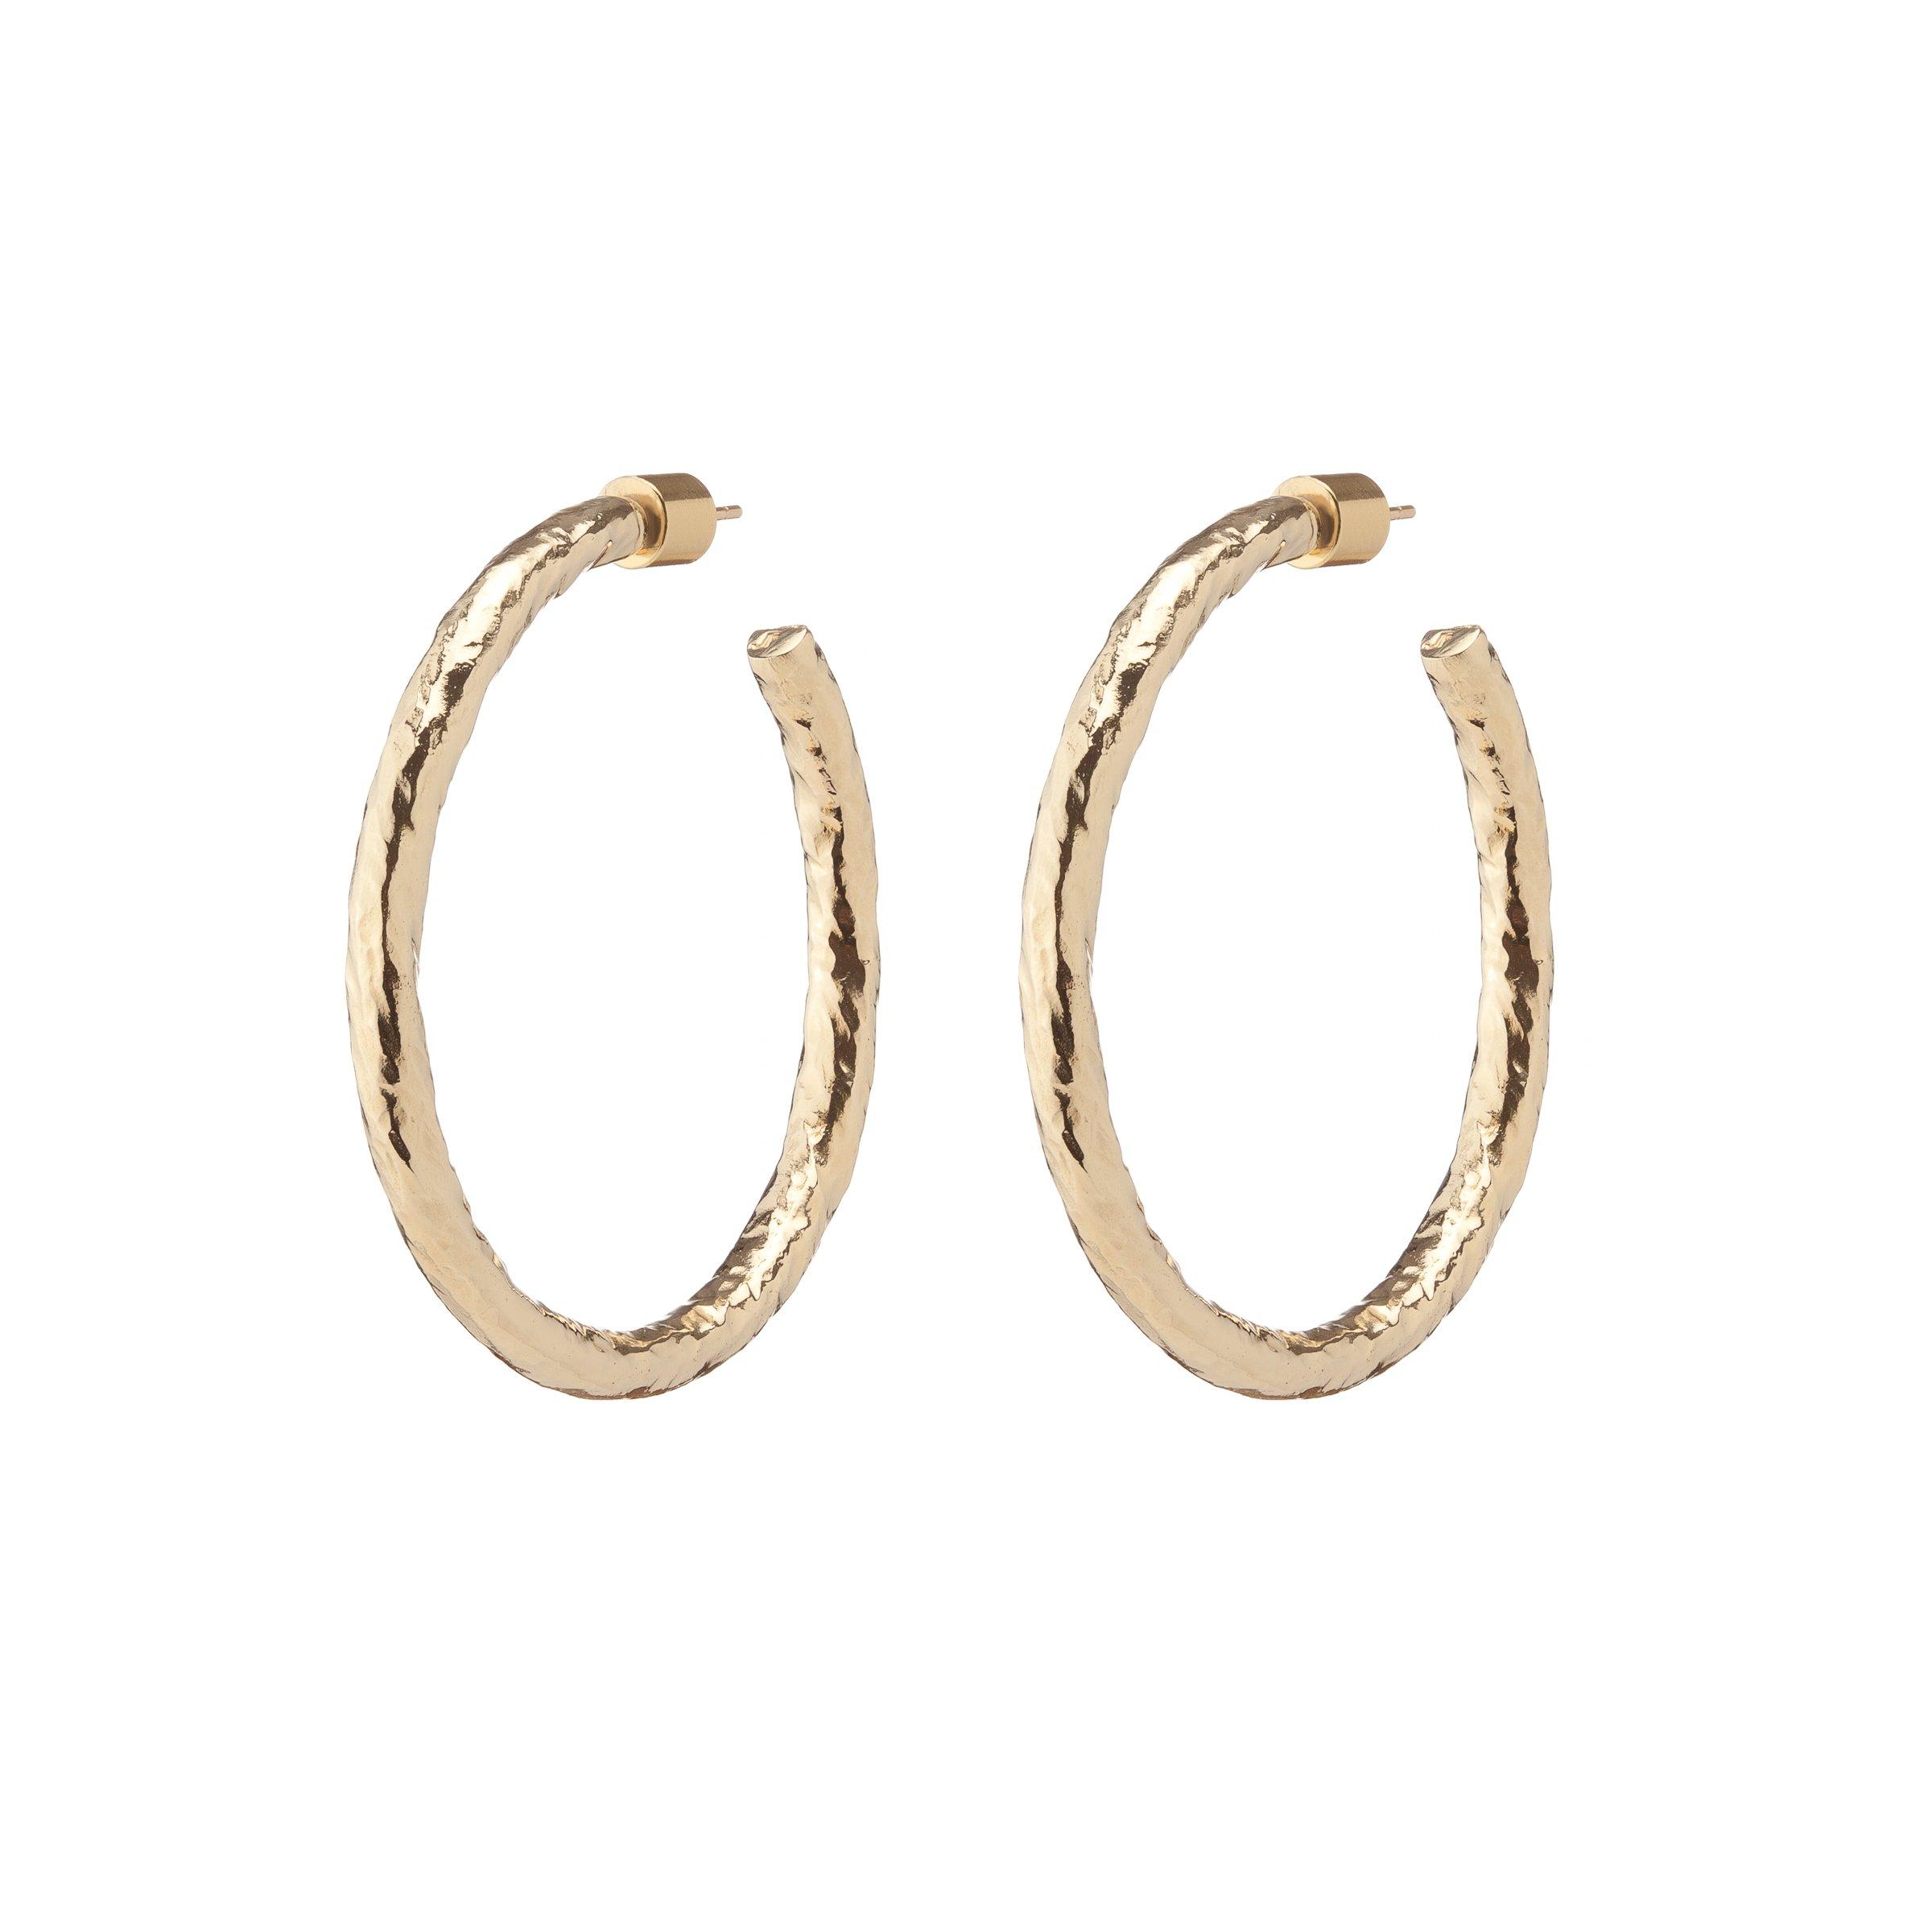 BABY HAILEY HOOPS by Jennifer Fisher, available on jenniferfisherjewelry.com for $550 Hailey Baldwin Jewellery Exact Product